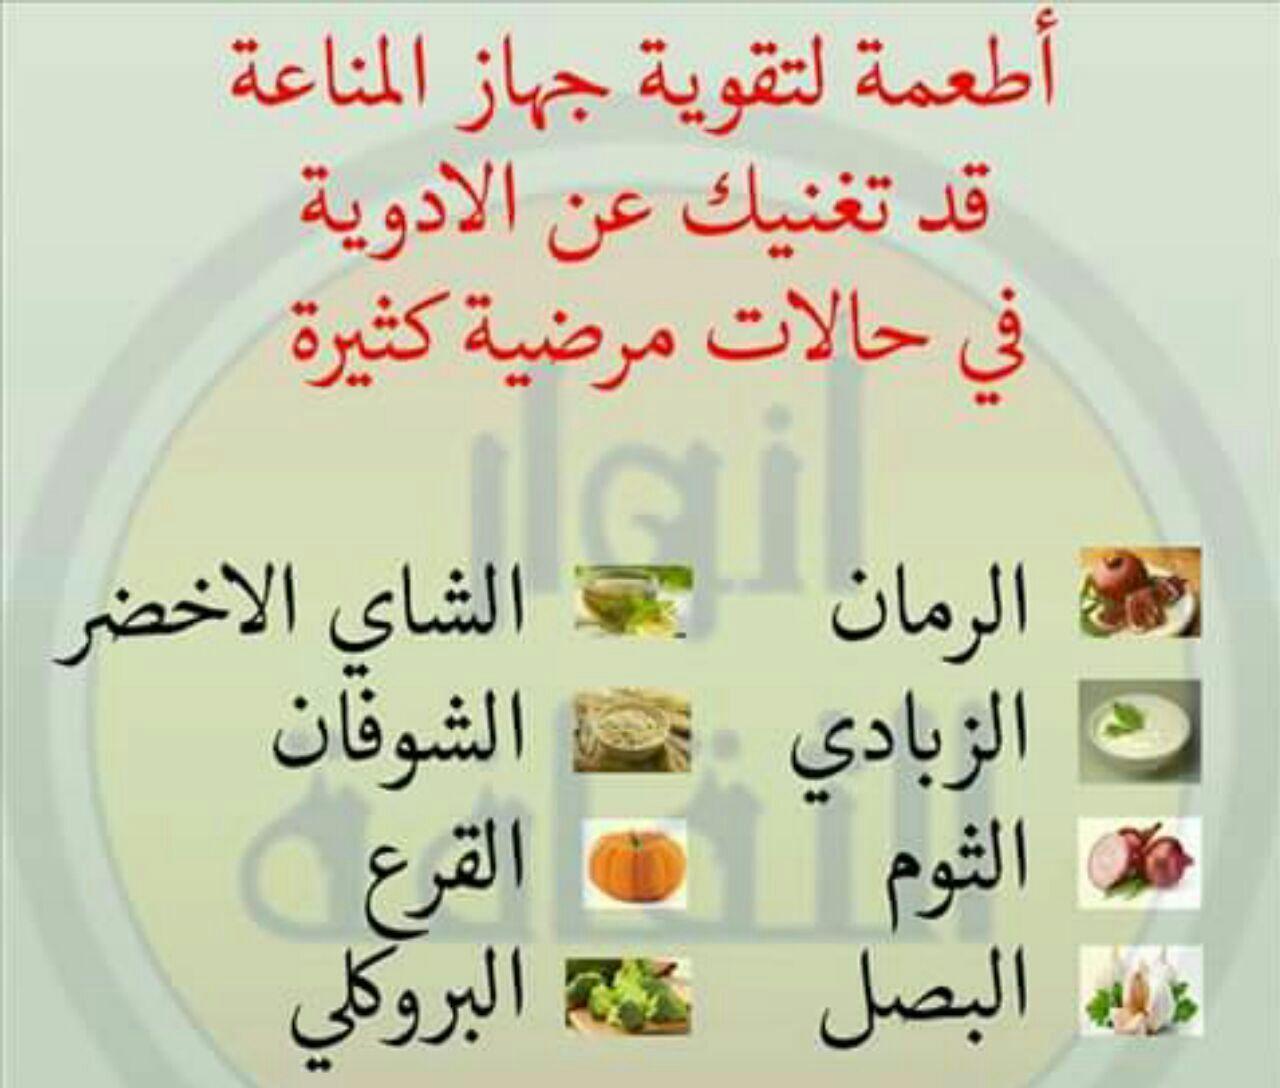 Pin By Hanan Ranosh On My Photo Save Health Fitness Nutrition Health Advice Health And Nutrition